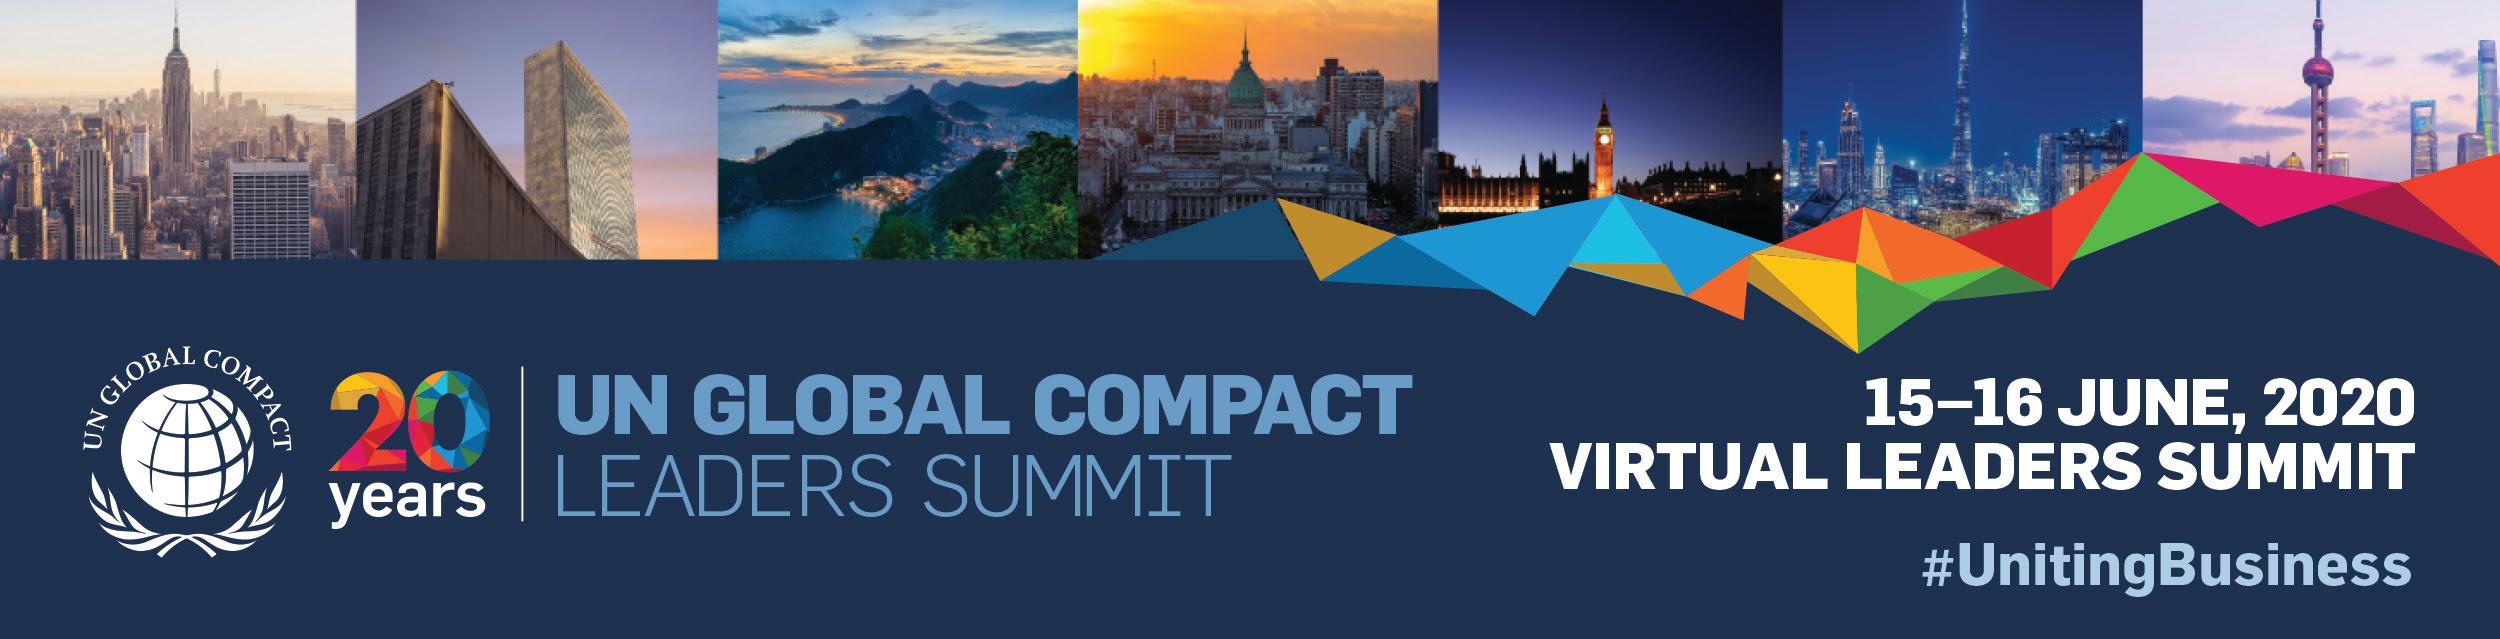 UN Global Compact Leaders Summit